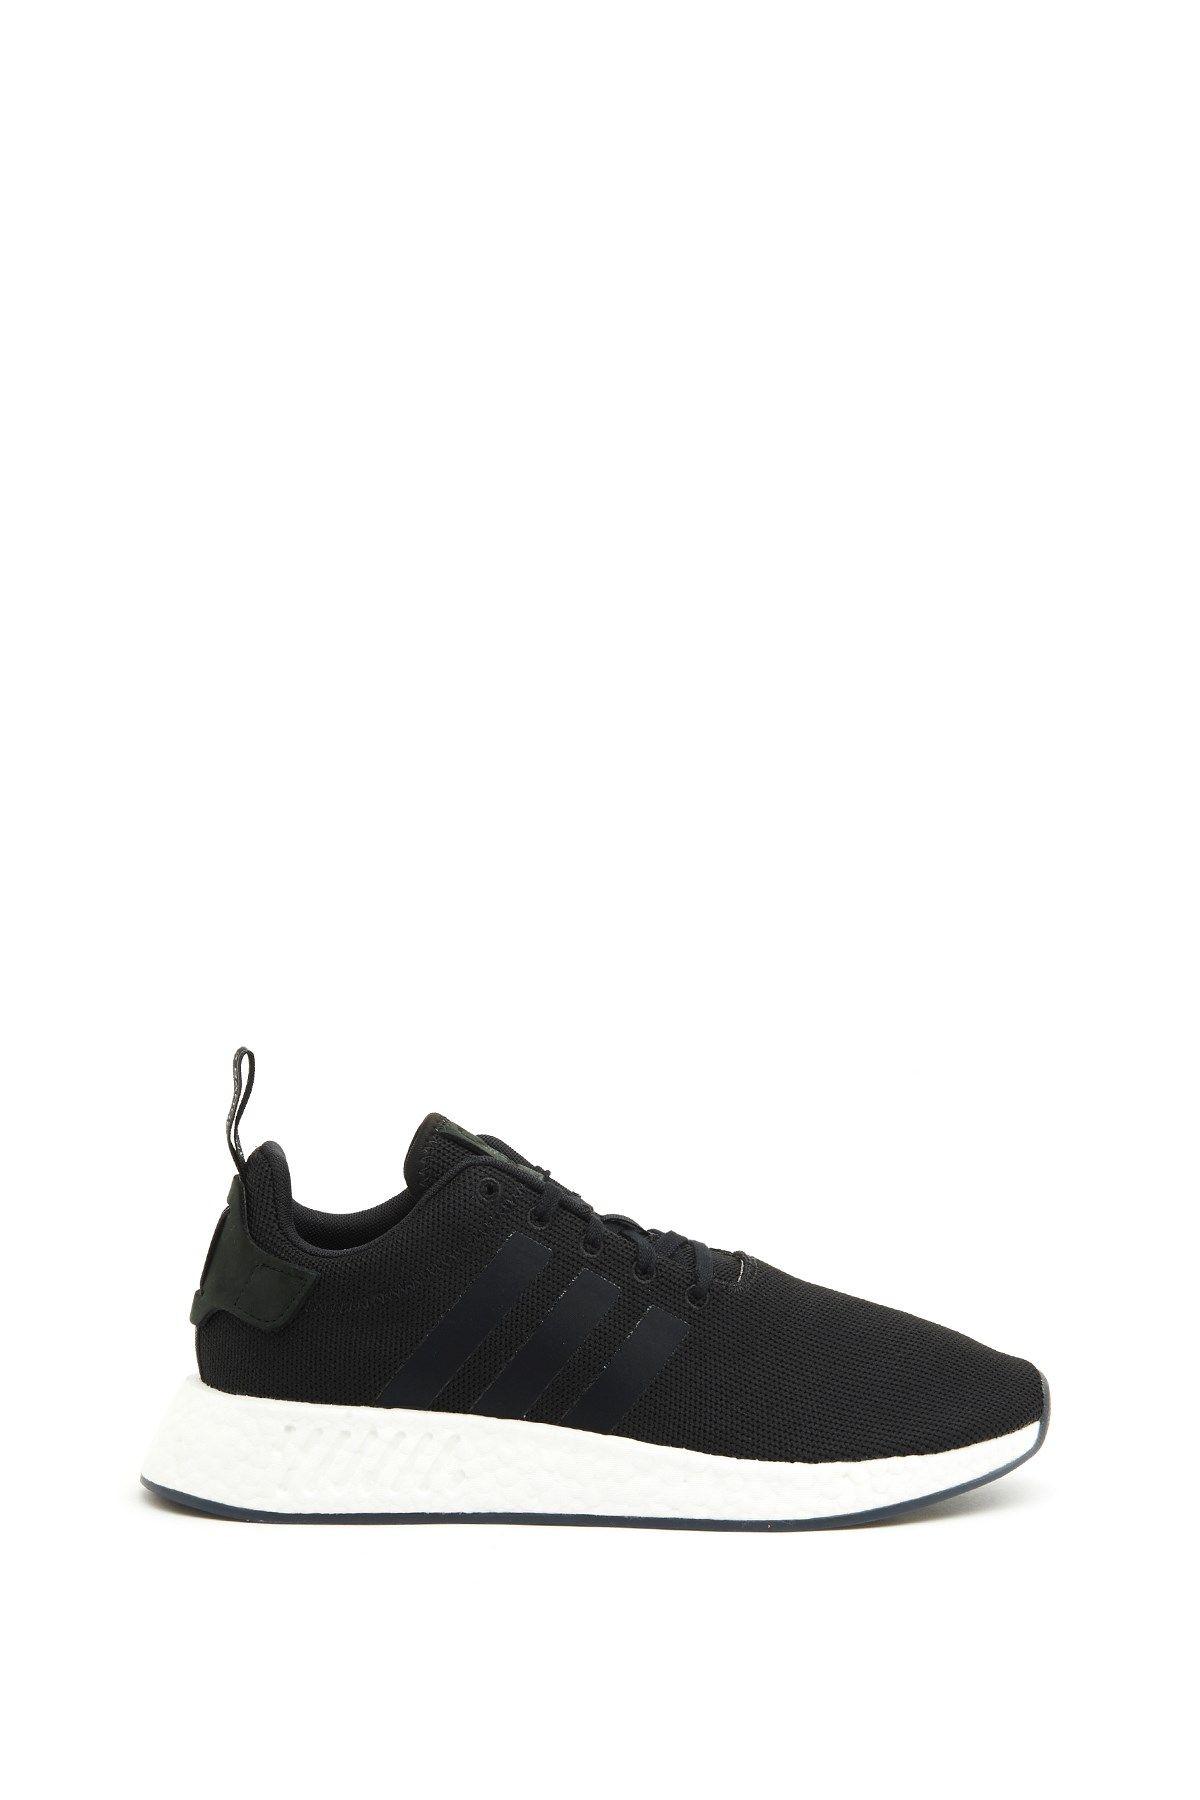 huge selection of 18d53 c1d5e ADIDAS ORIGINALS nmd r2 sneakers.  adidasoriginals  shoes